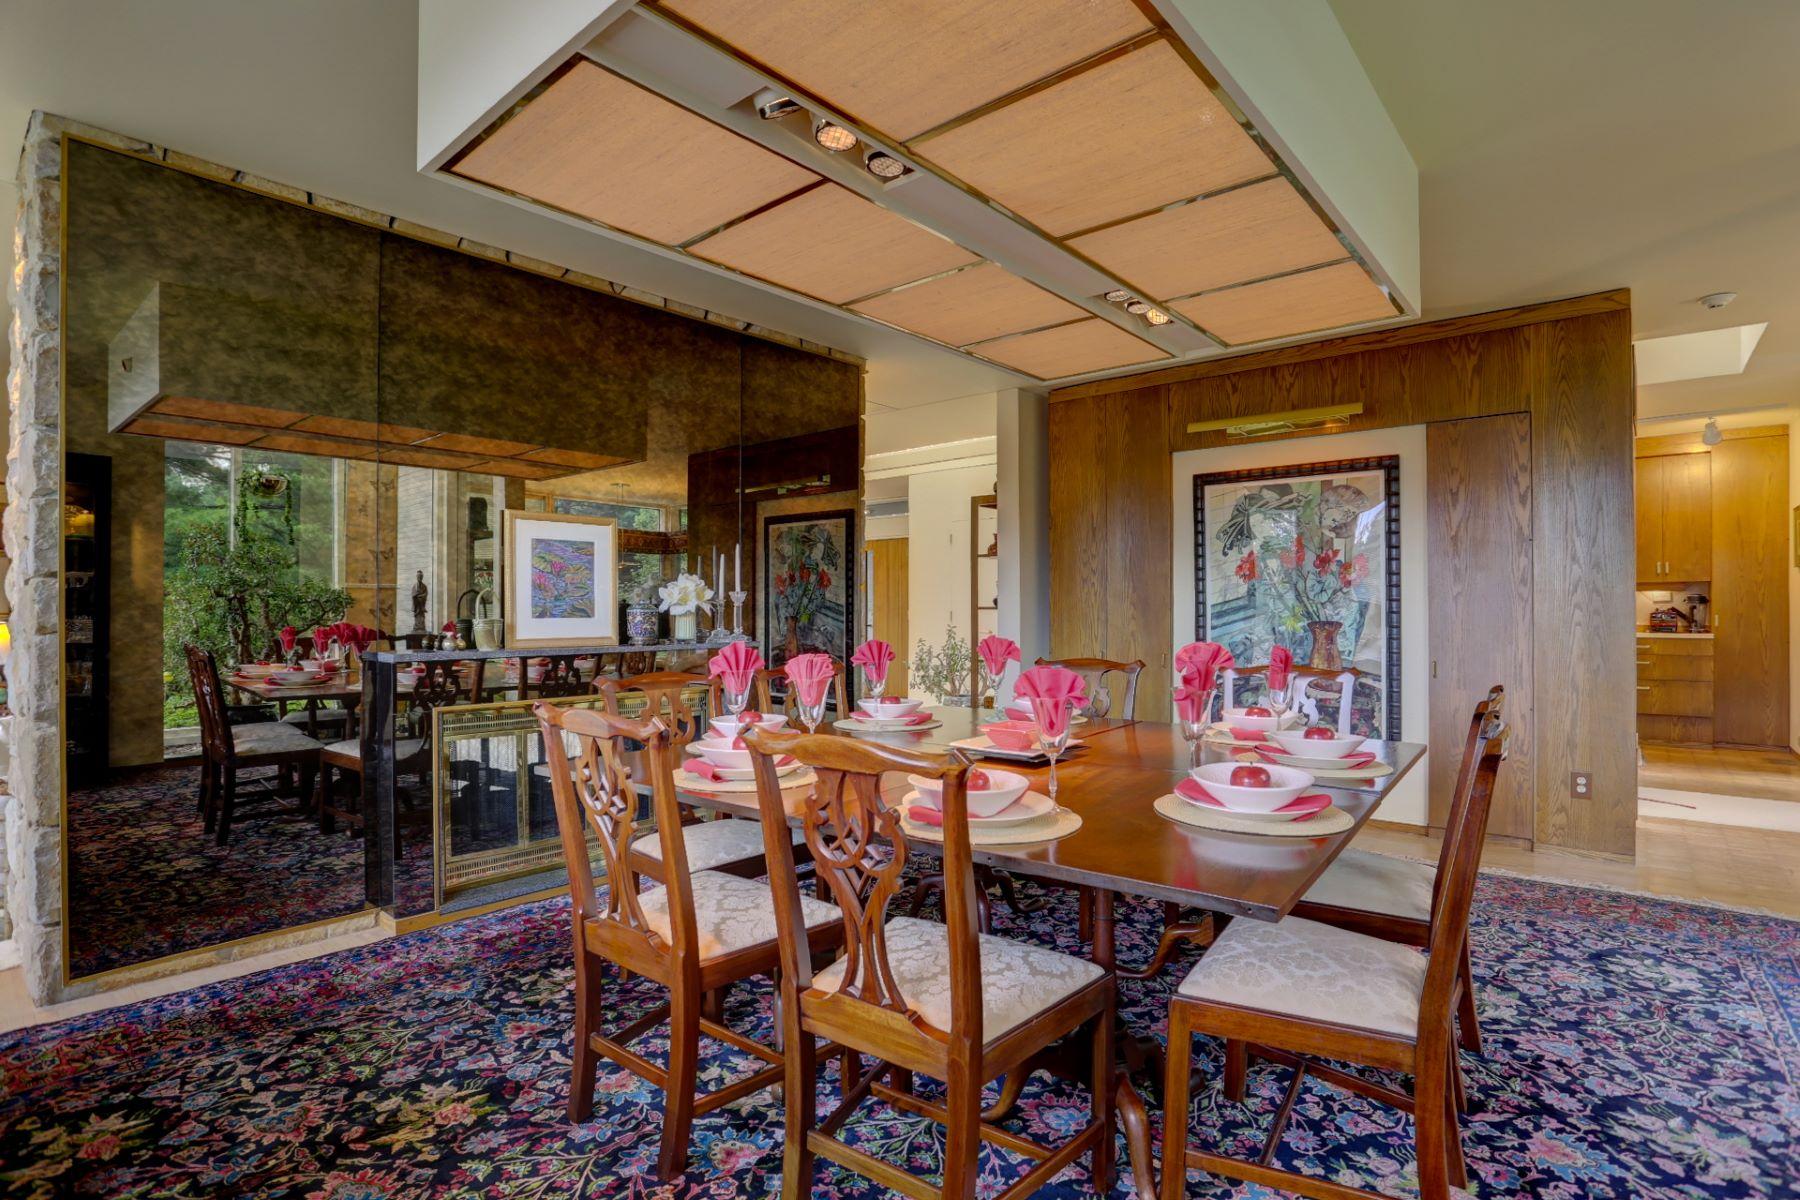 Additional photo for property listing at 193 Eshelman Road  Lancaster, Pennsylvania 17601 Estados Unidos